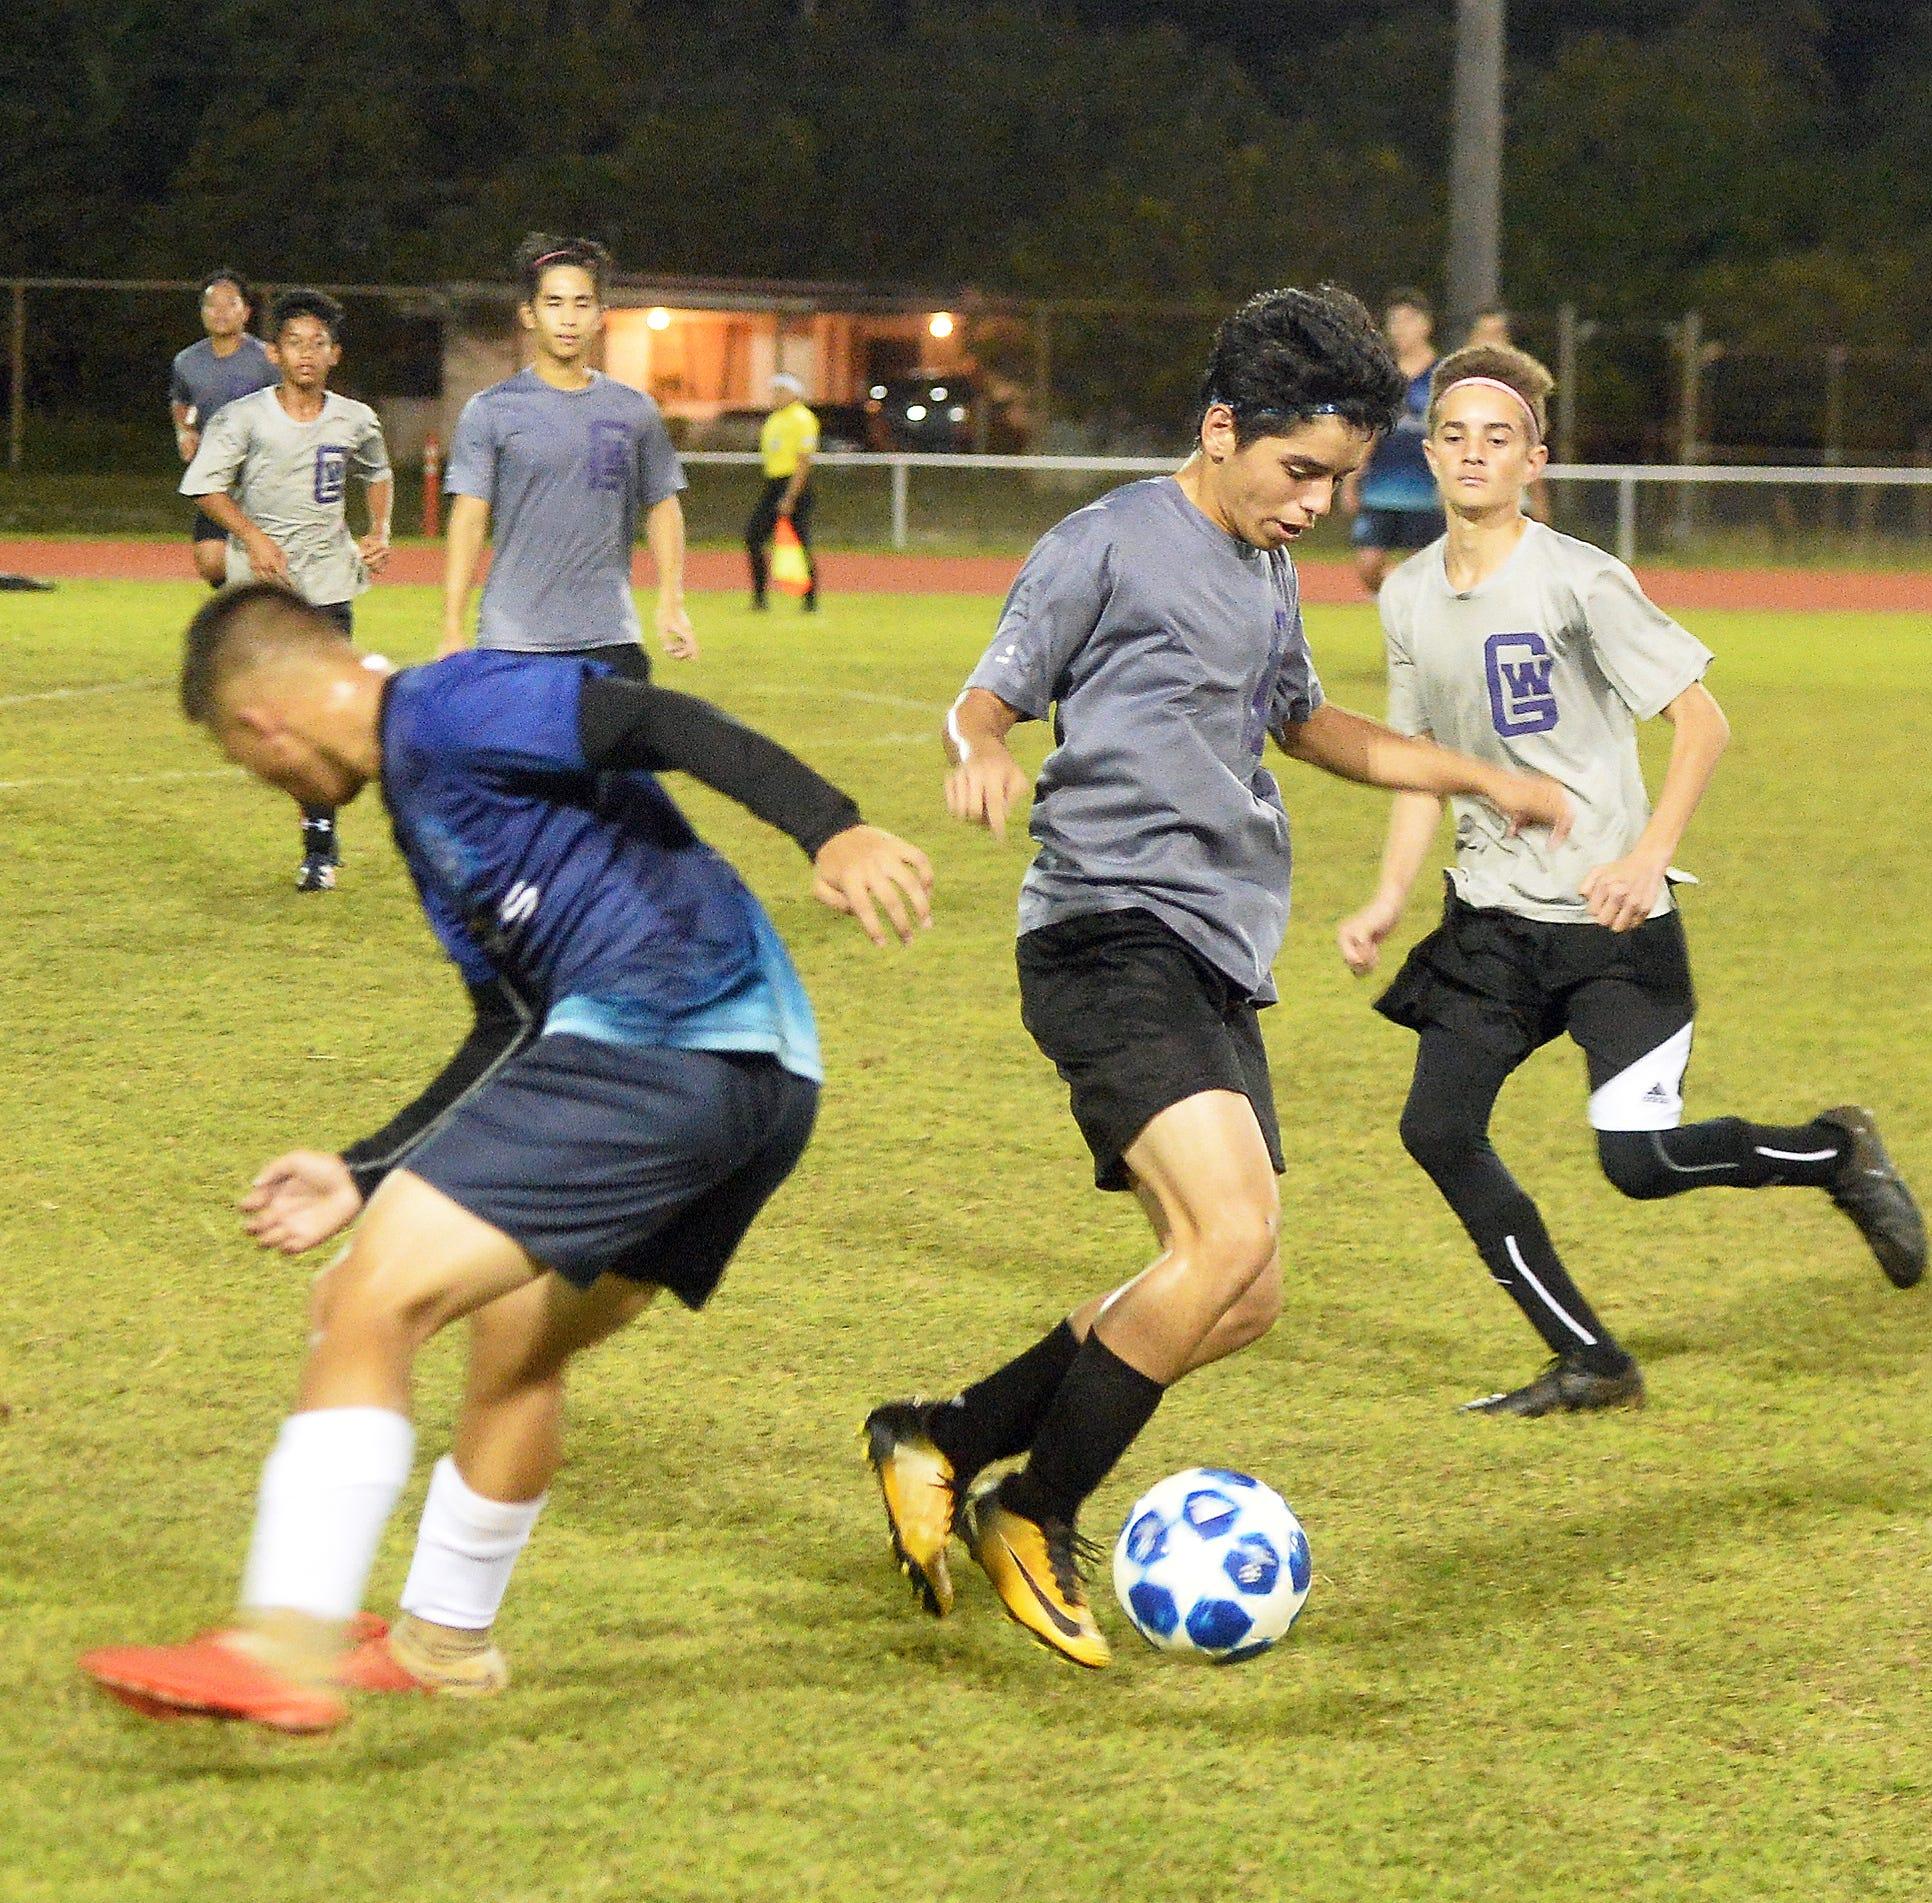 Royals finally get soccer win